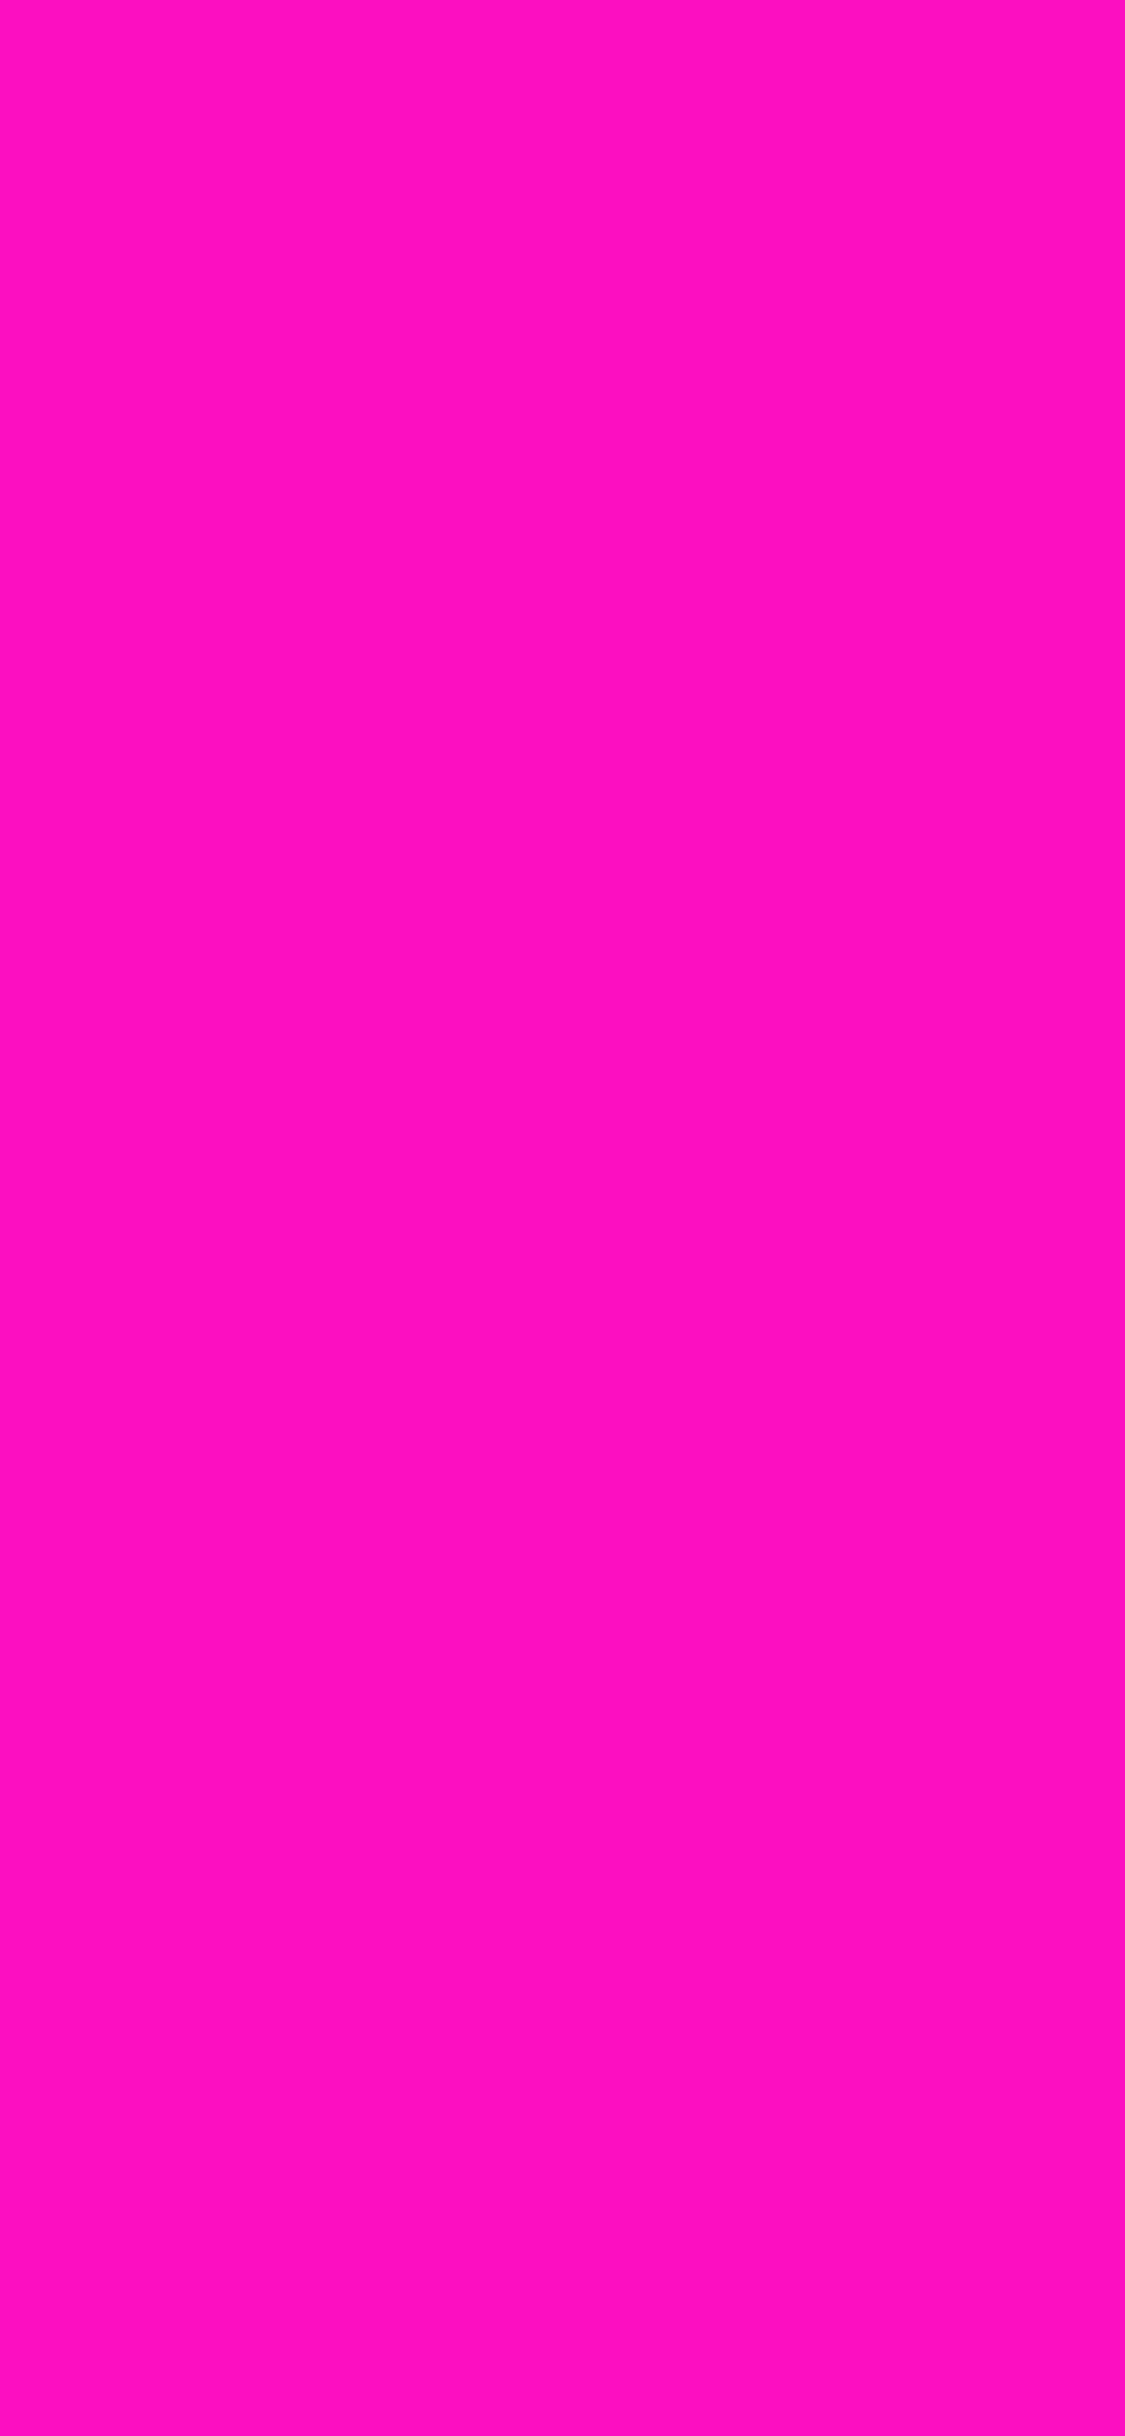 1125x2436 Shocking Pink Solid Color Background